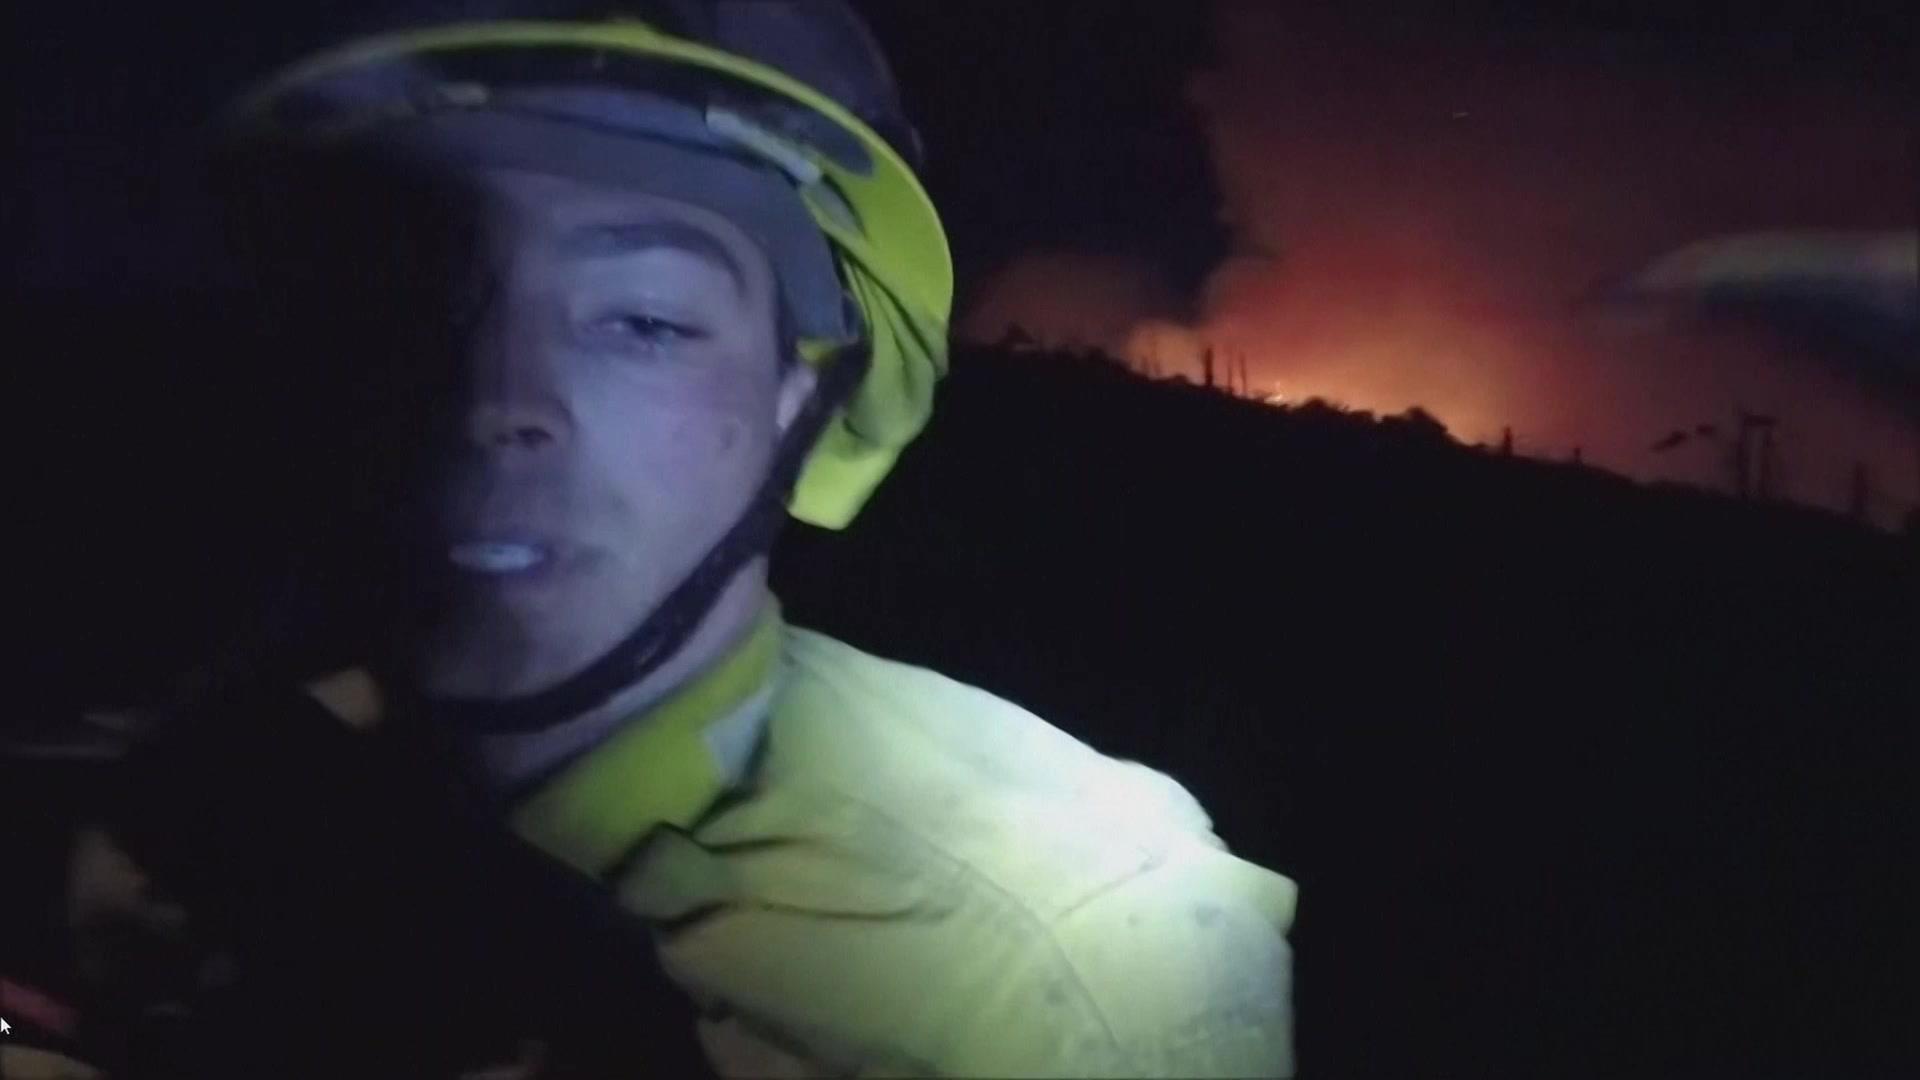 boie_a_us_ca_firefighters_rescue-00.01.45.12.jpg